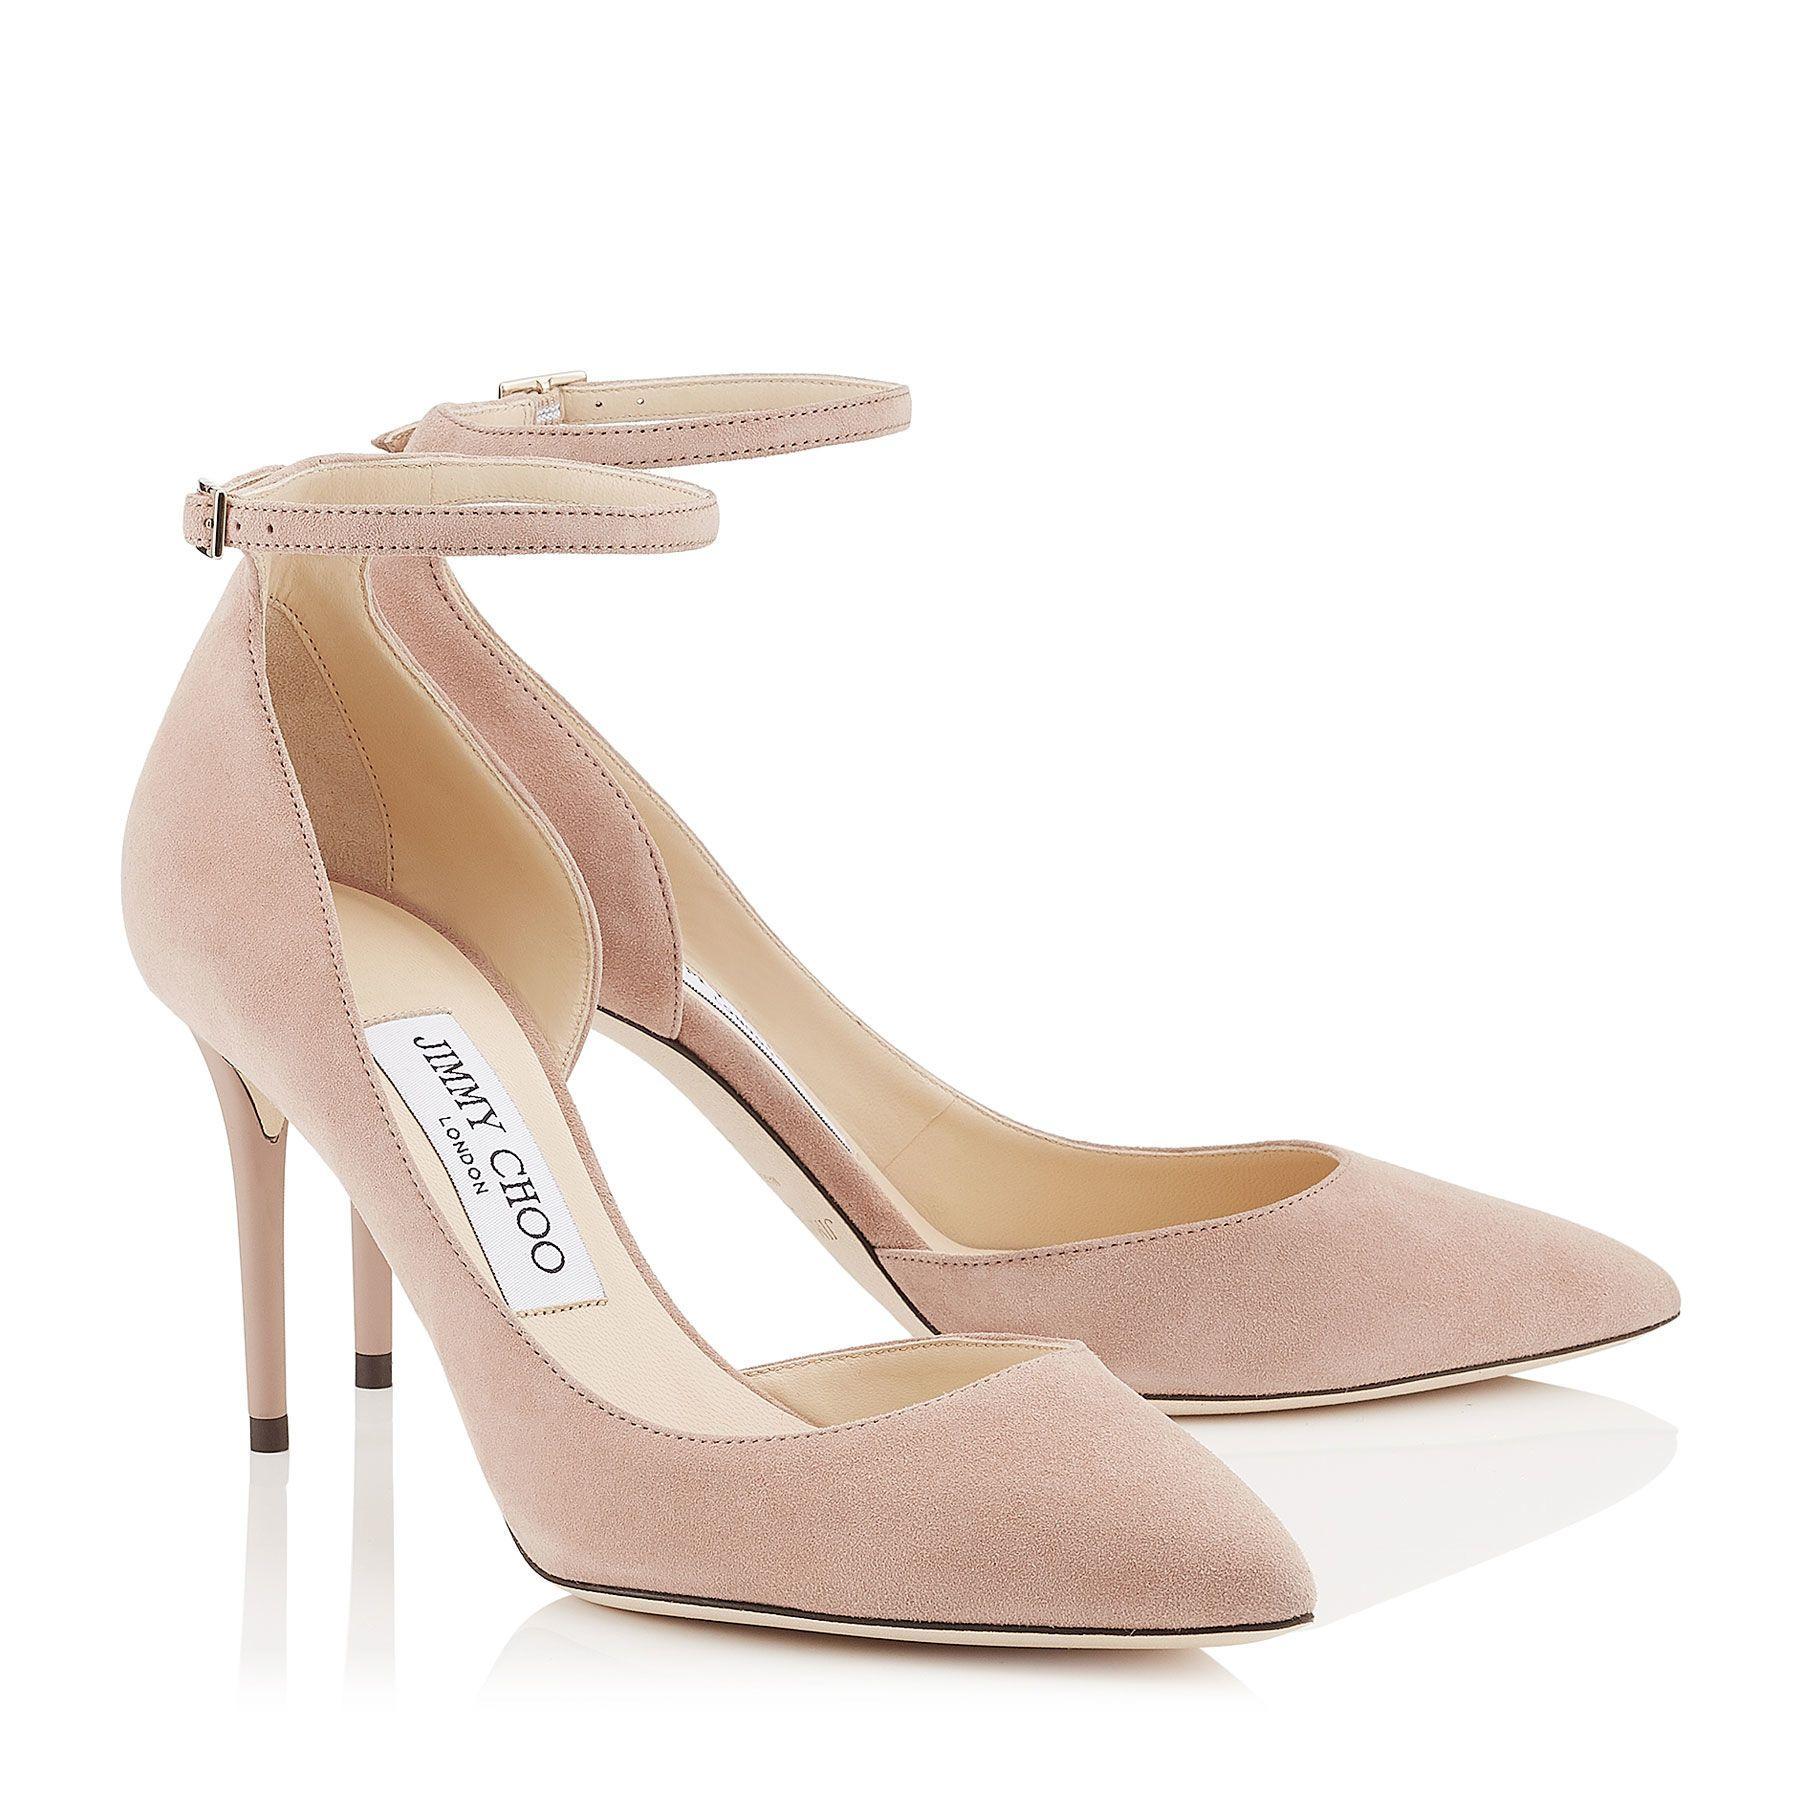 Ballet Pink Suede Pointy Toe Pumps Lucy 85 Pre Fall 17 Jimmy Choo Jimmy Choo Heels Fashion Heels Pink Suede Pumps